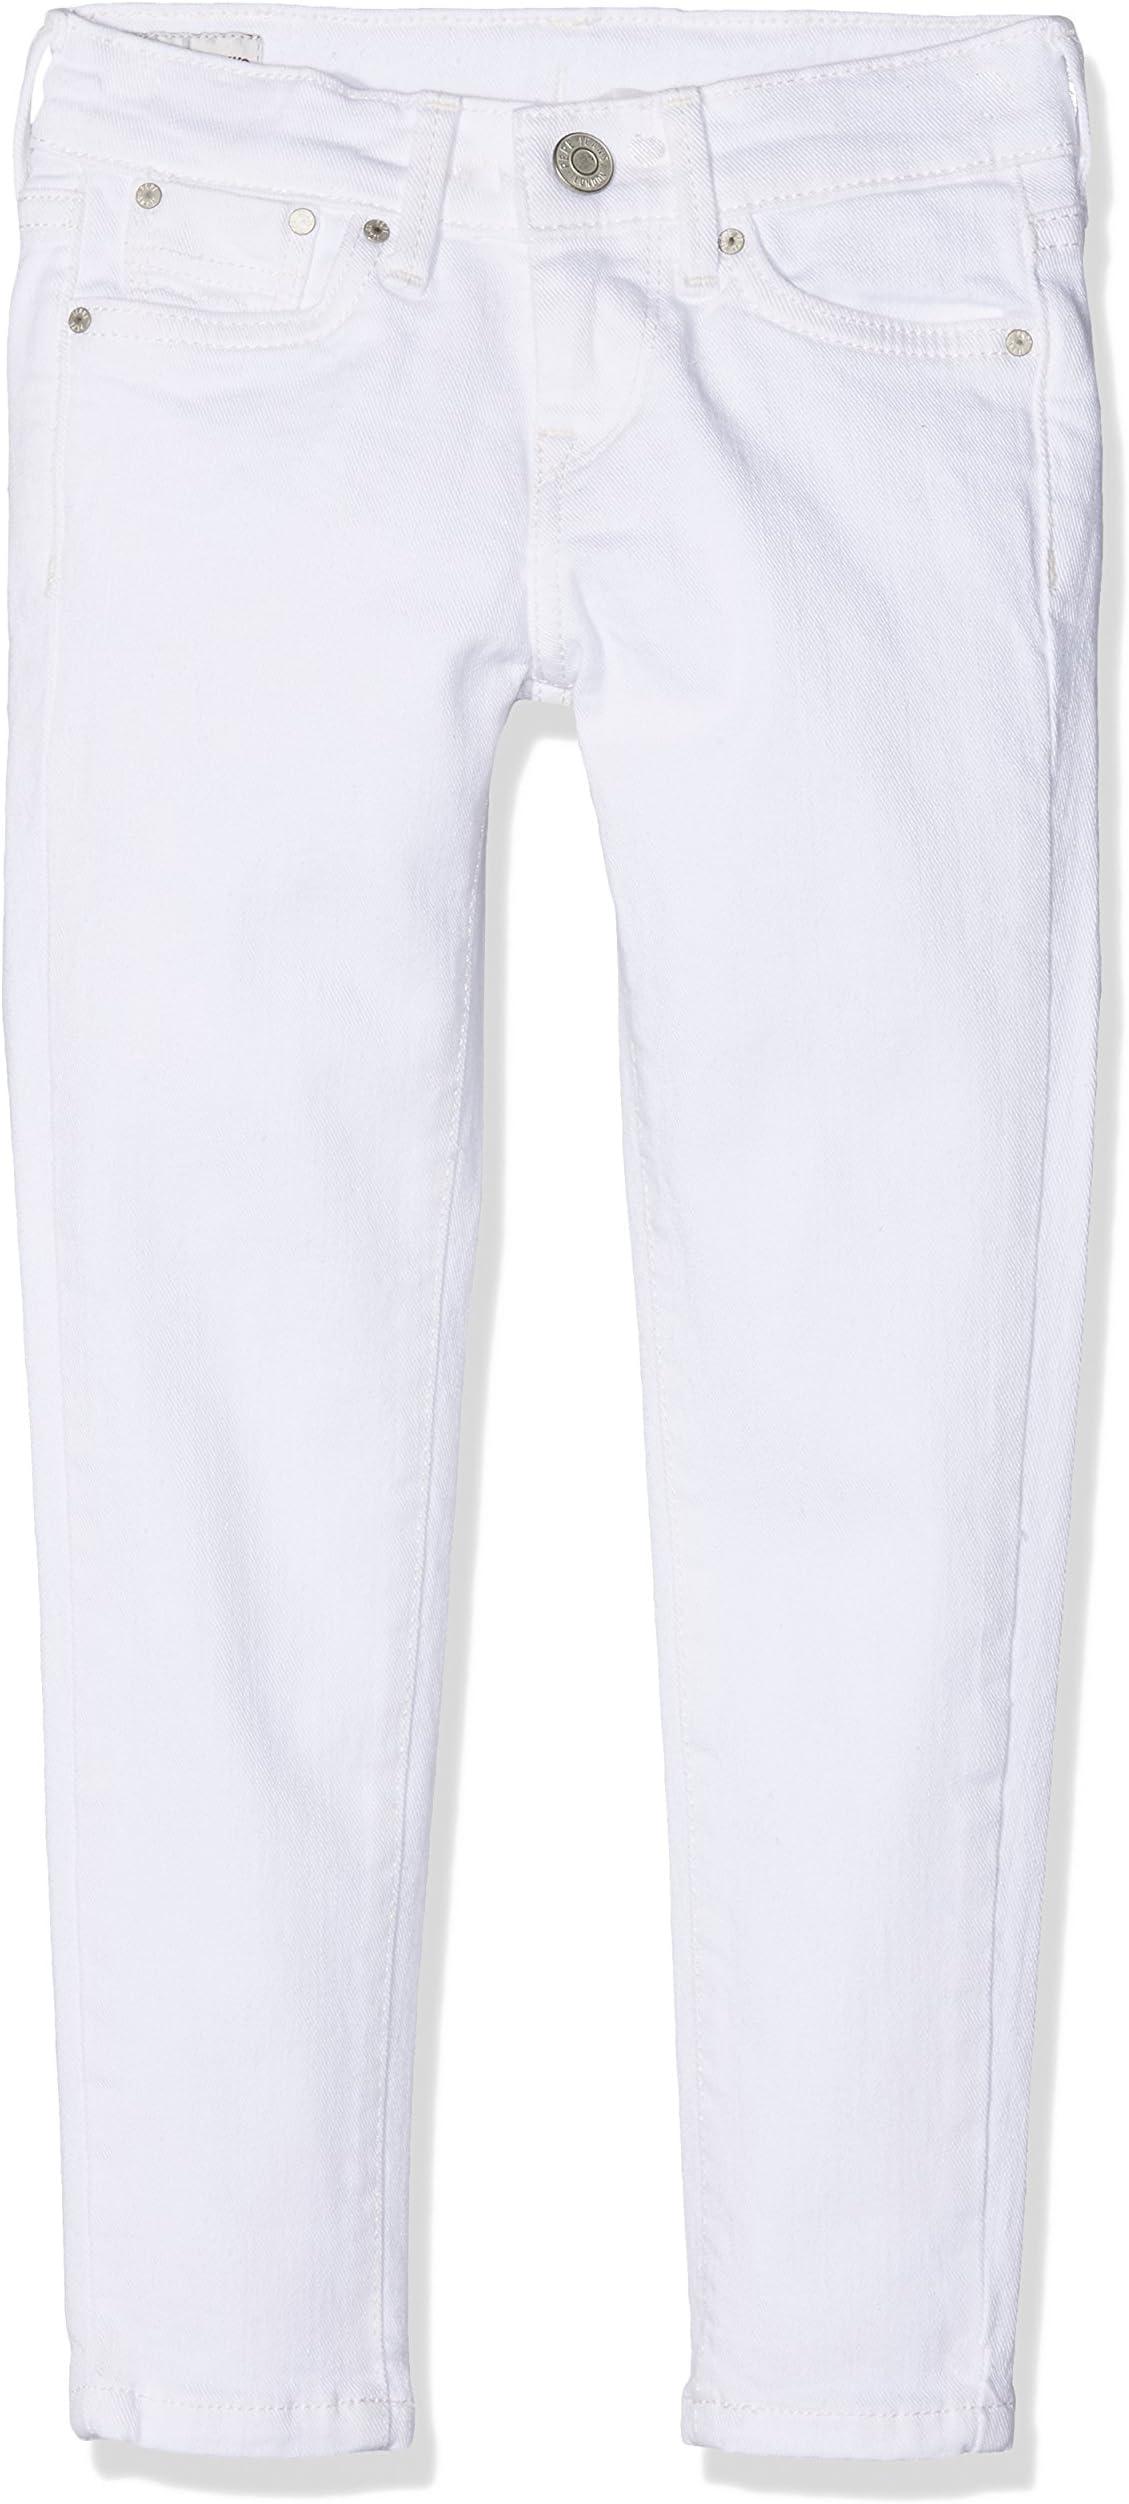 Moncler Pantalones De Chᄄᄁndal naranja